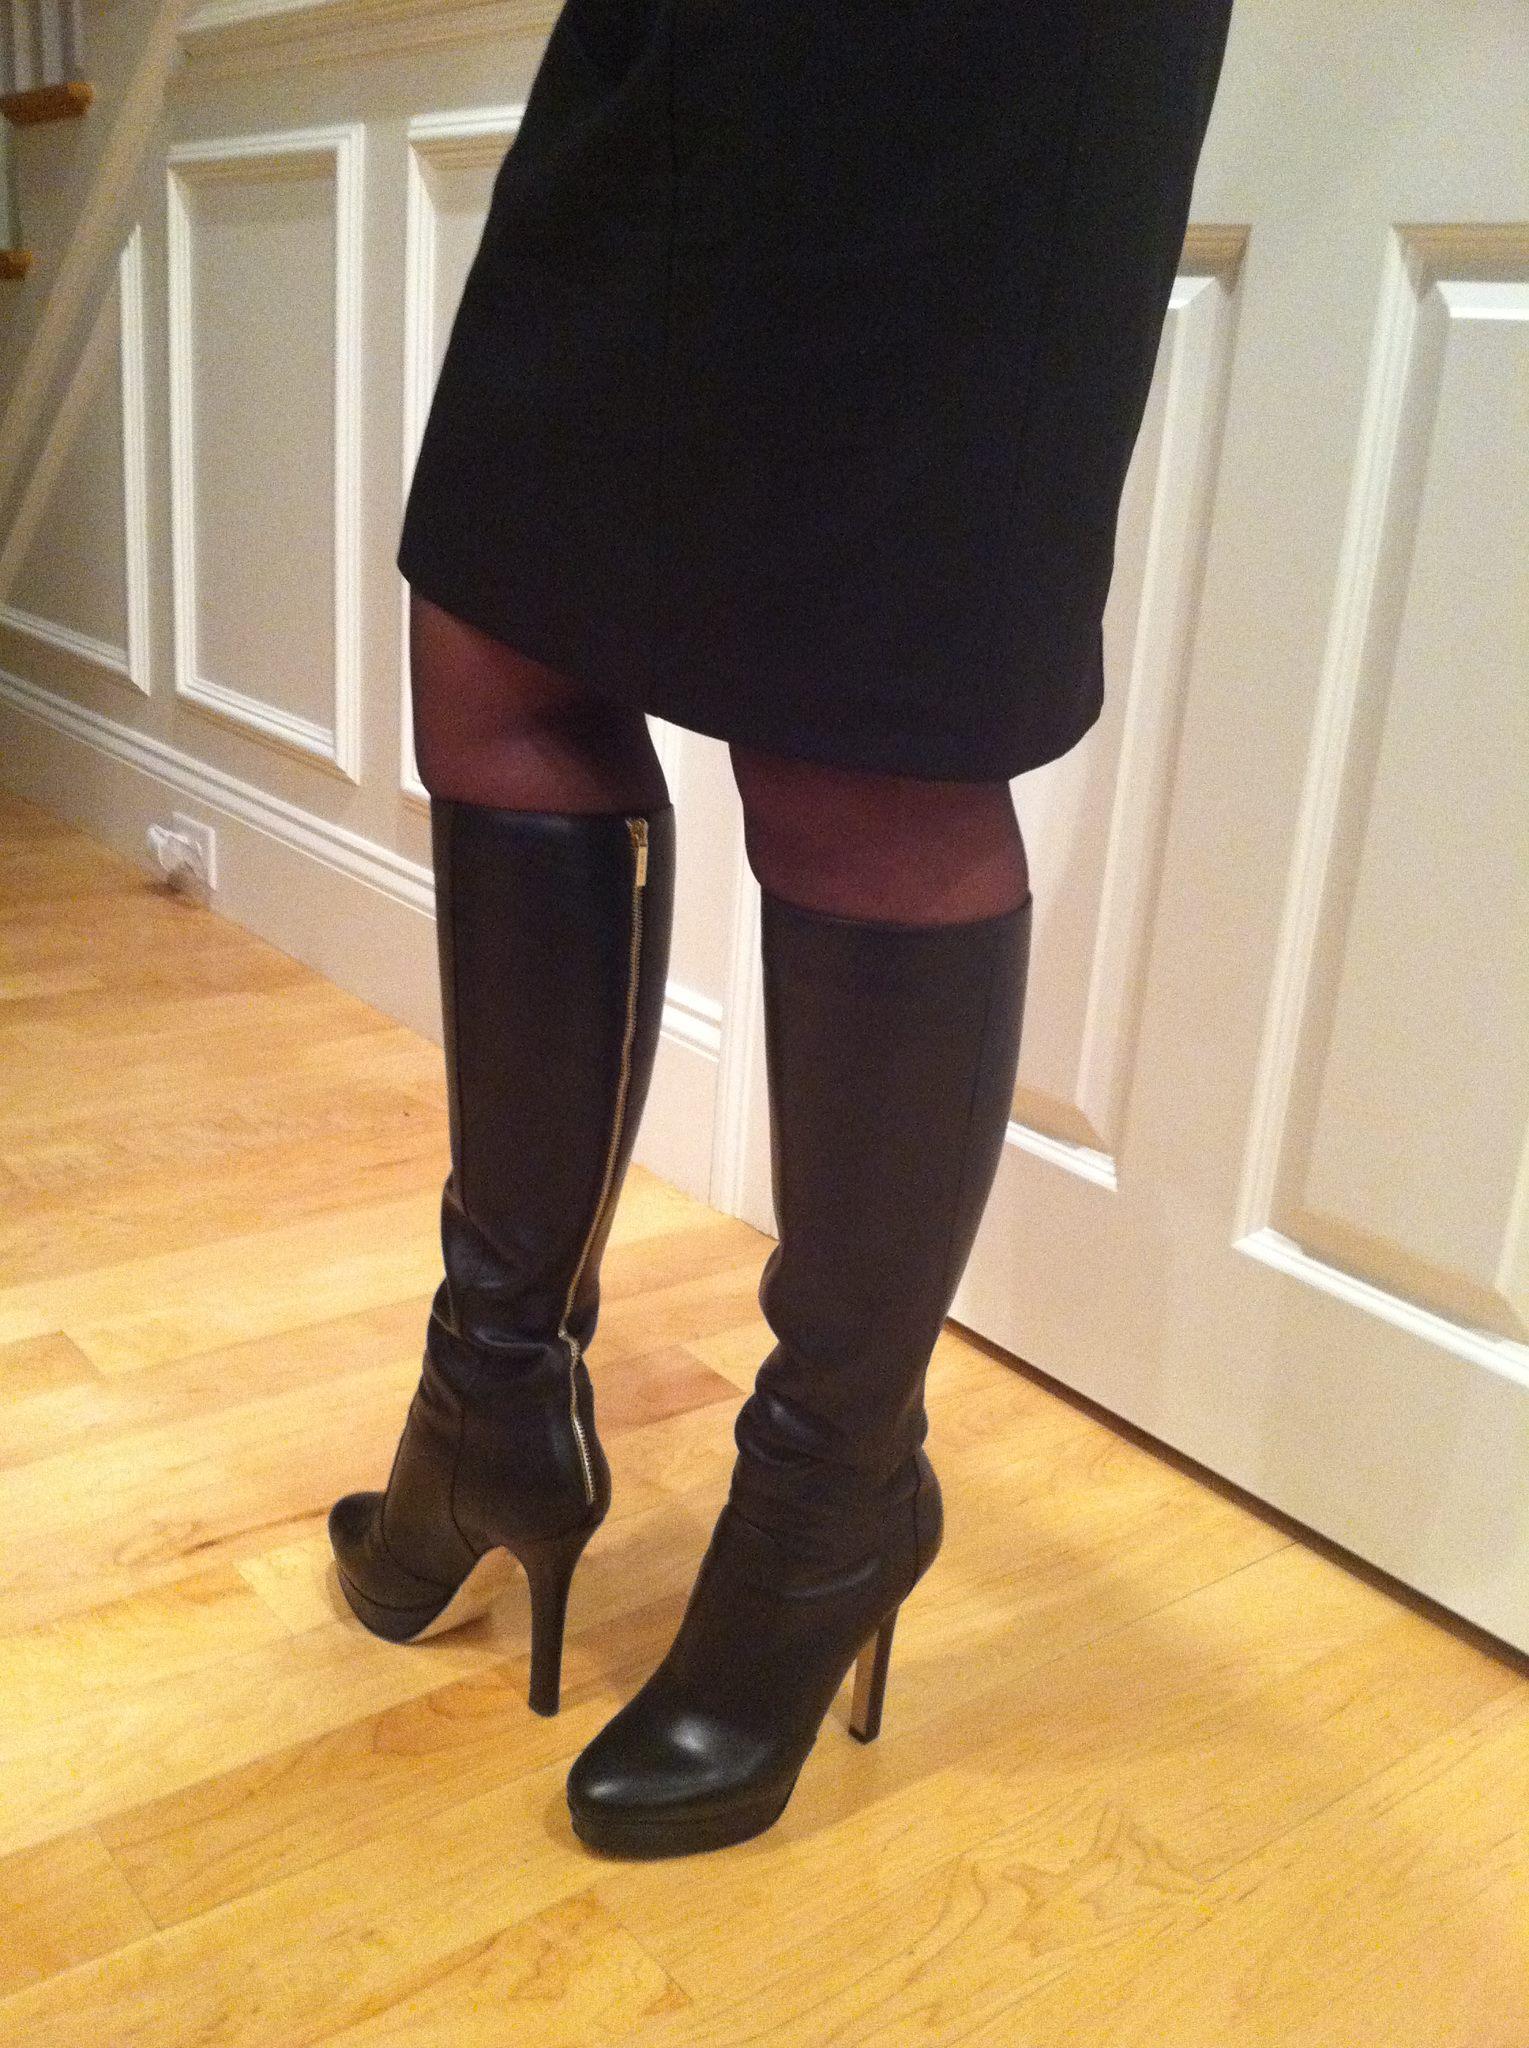 image My jimmy choo high heels amp nylon covered feet upskirt